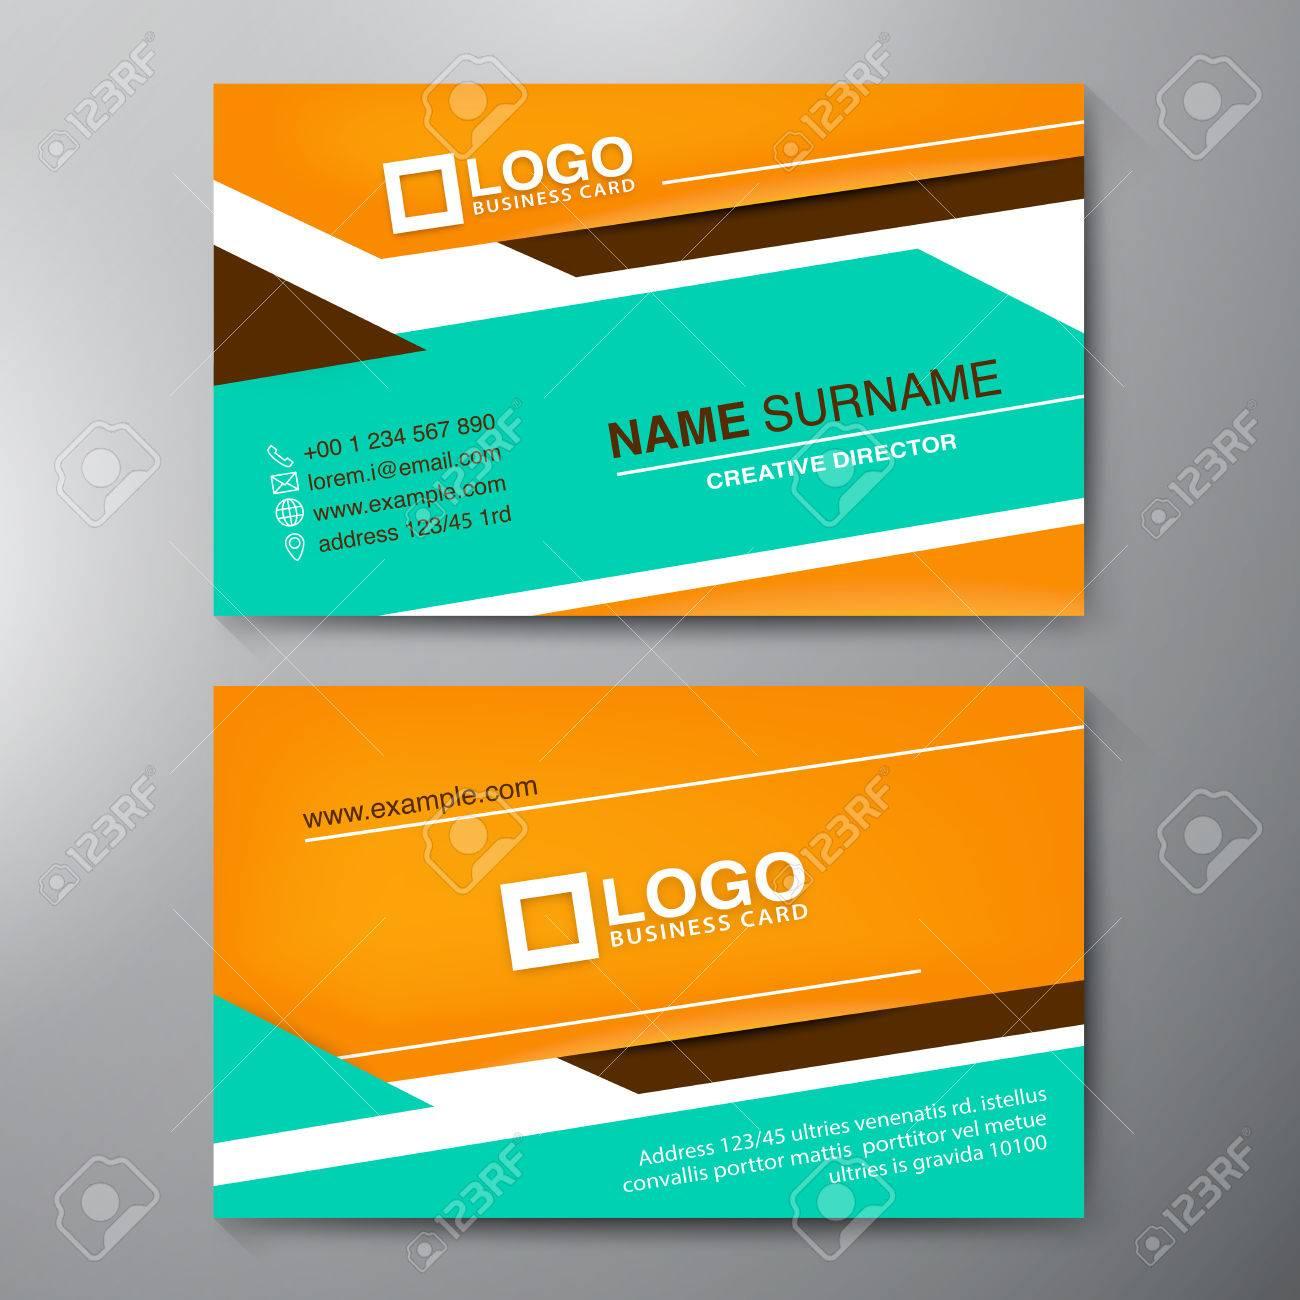 Modern Business Card Design Template. Vector Illustration Royalty ...